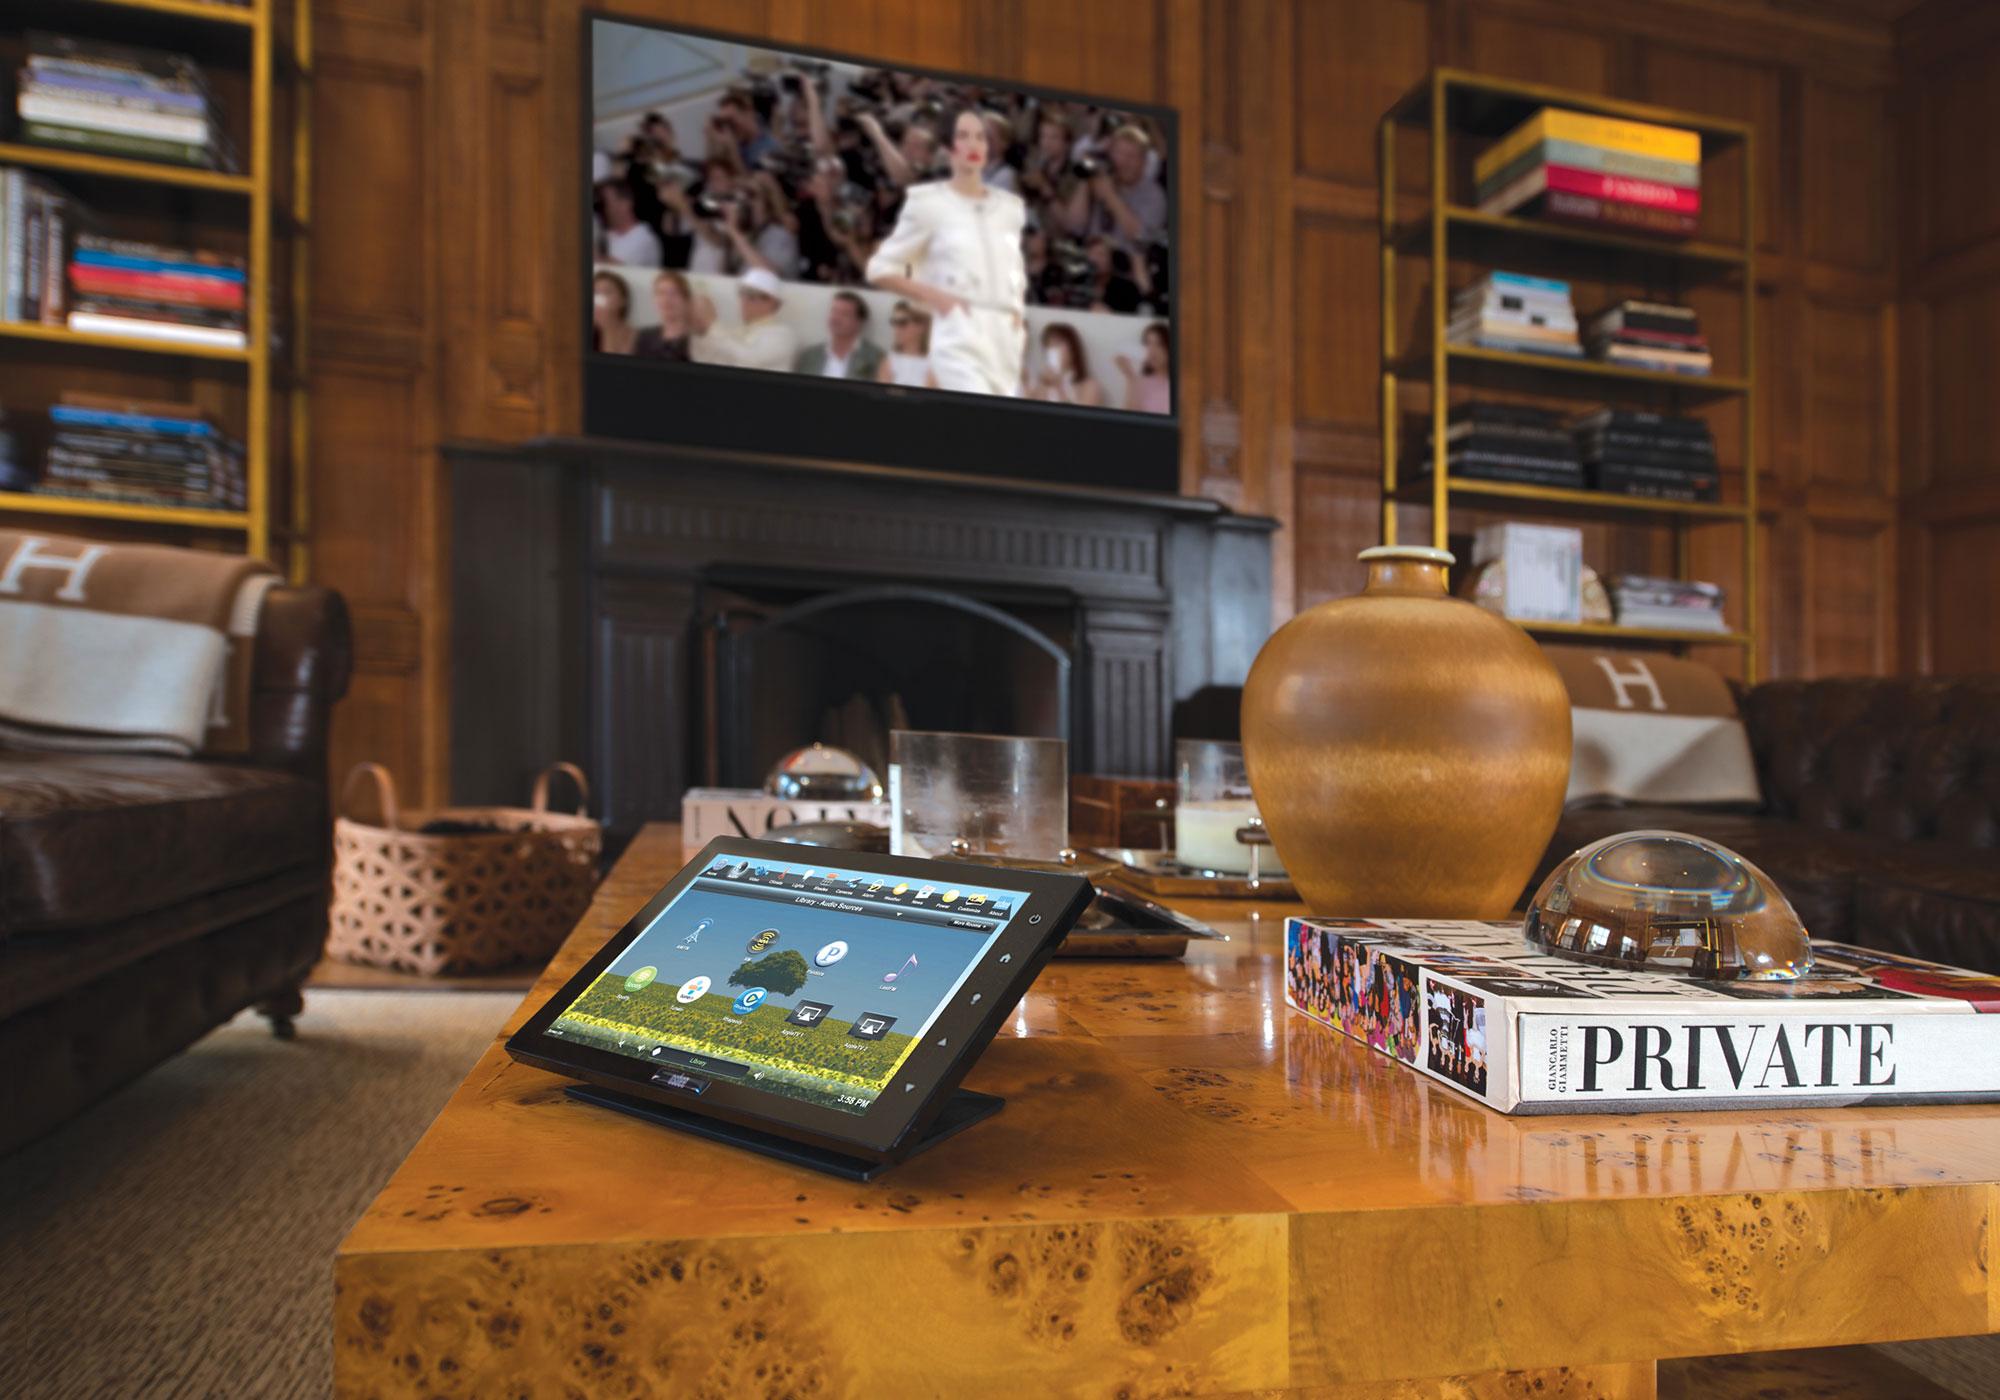 living room, media room, library, TV, soundbar, touchscreen, tabletop touchscreen, audio screen